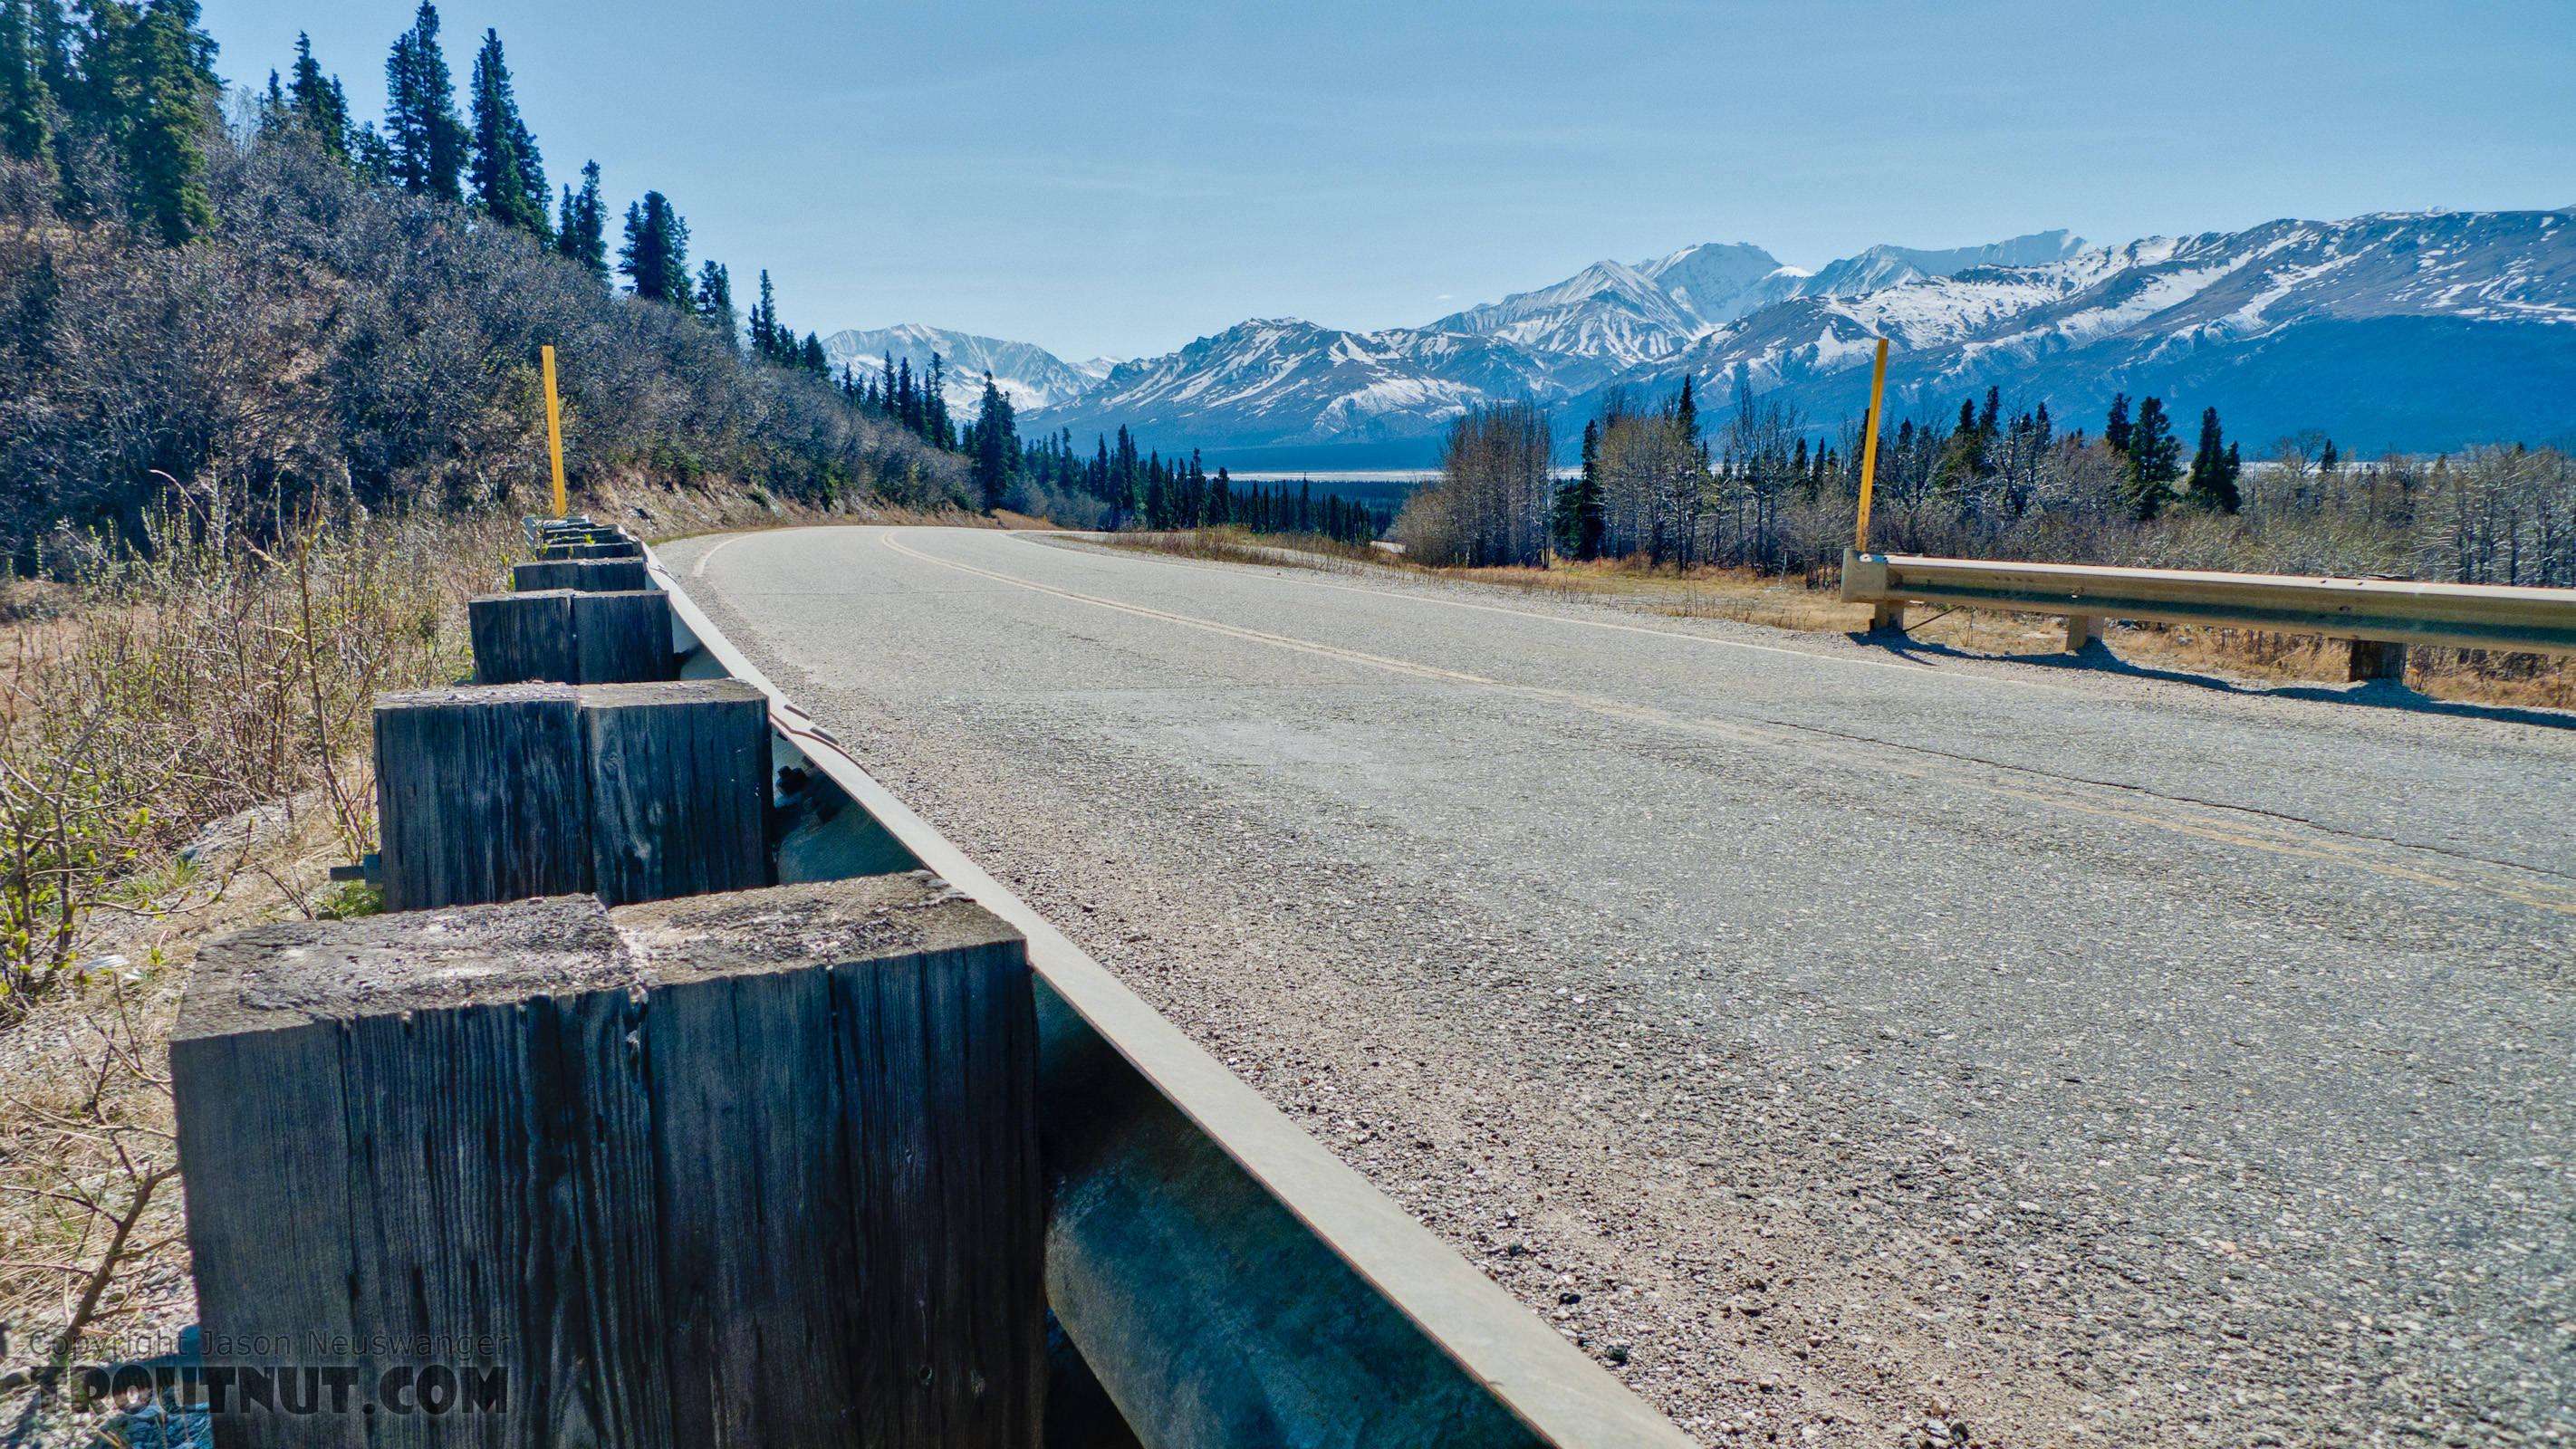 From Bear Creek in Alaska.